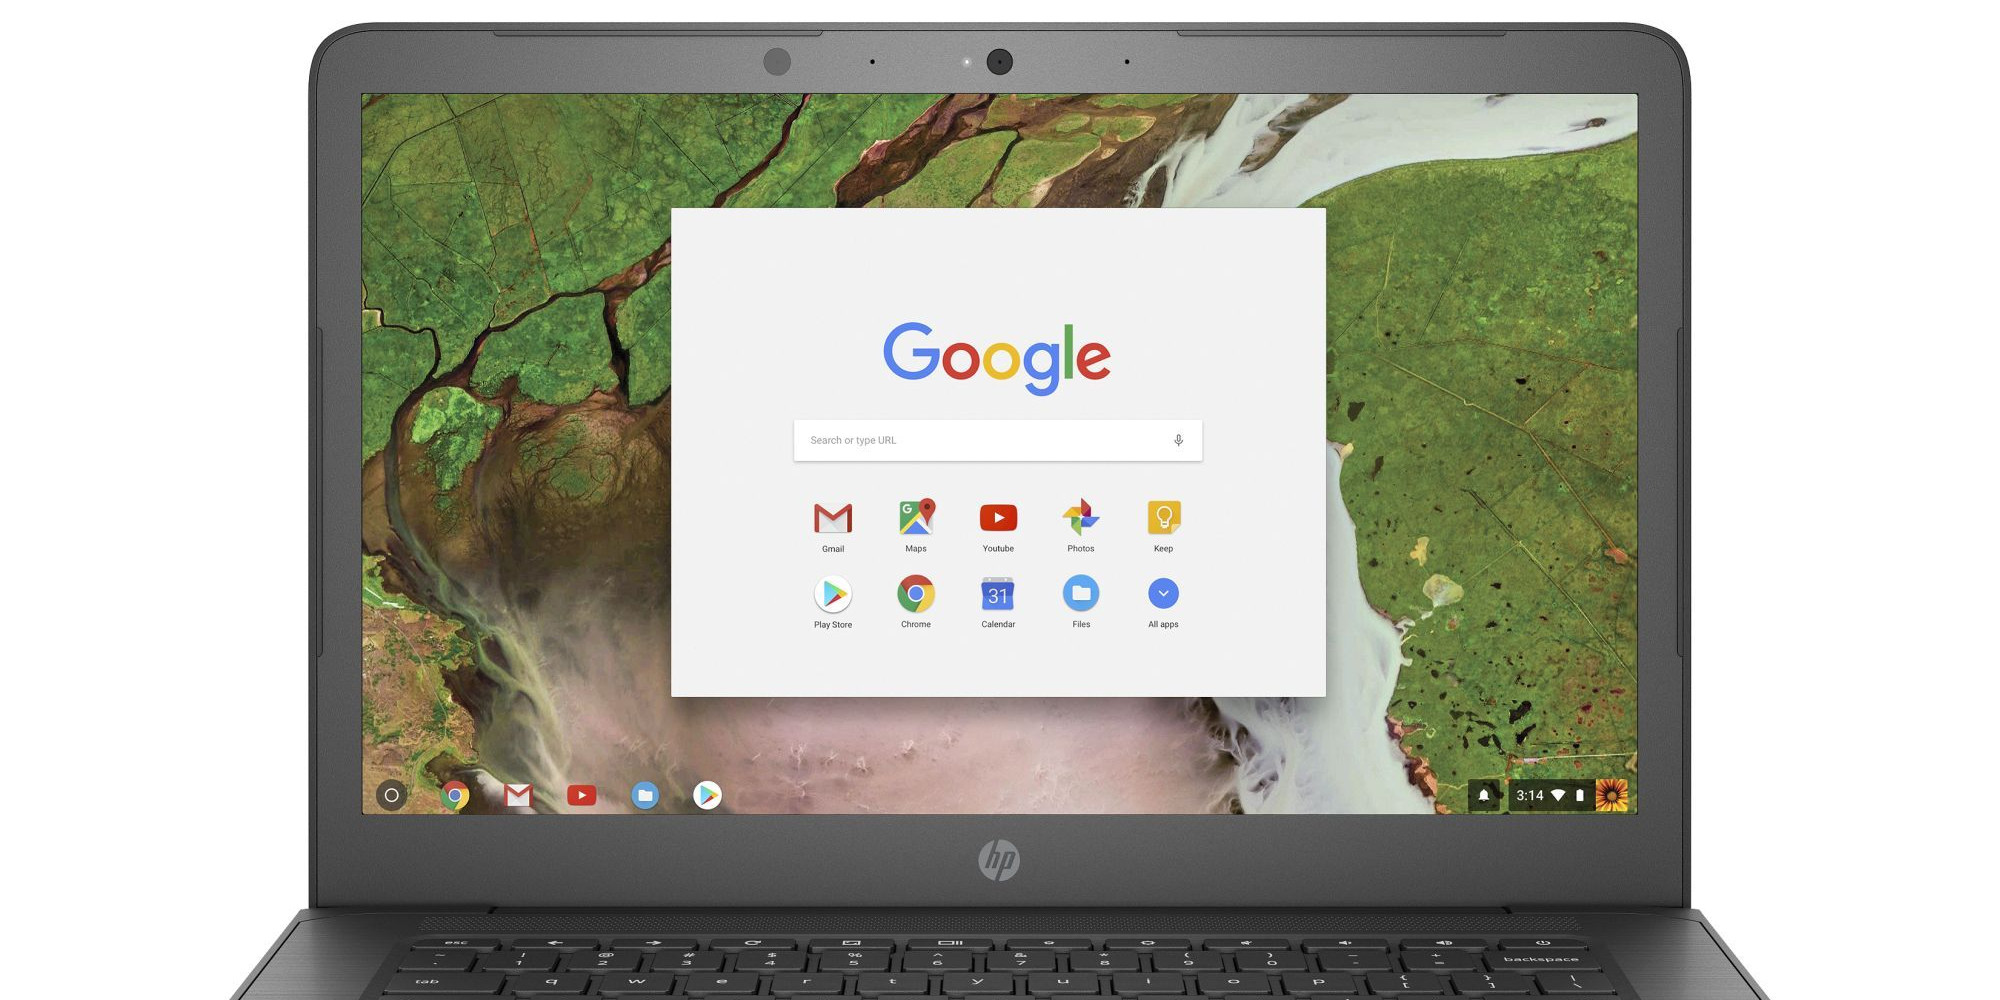 HP Chromebook 14 als erstes Chrome OS-Gerät mit AMD-Prozessor